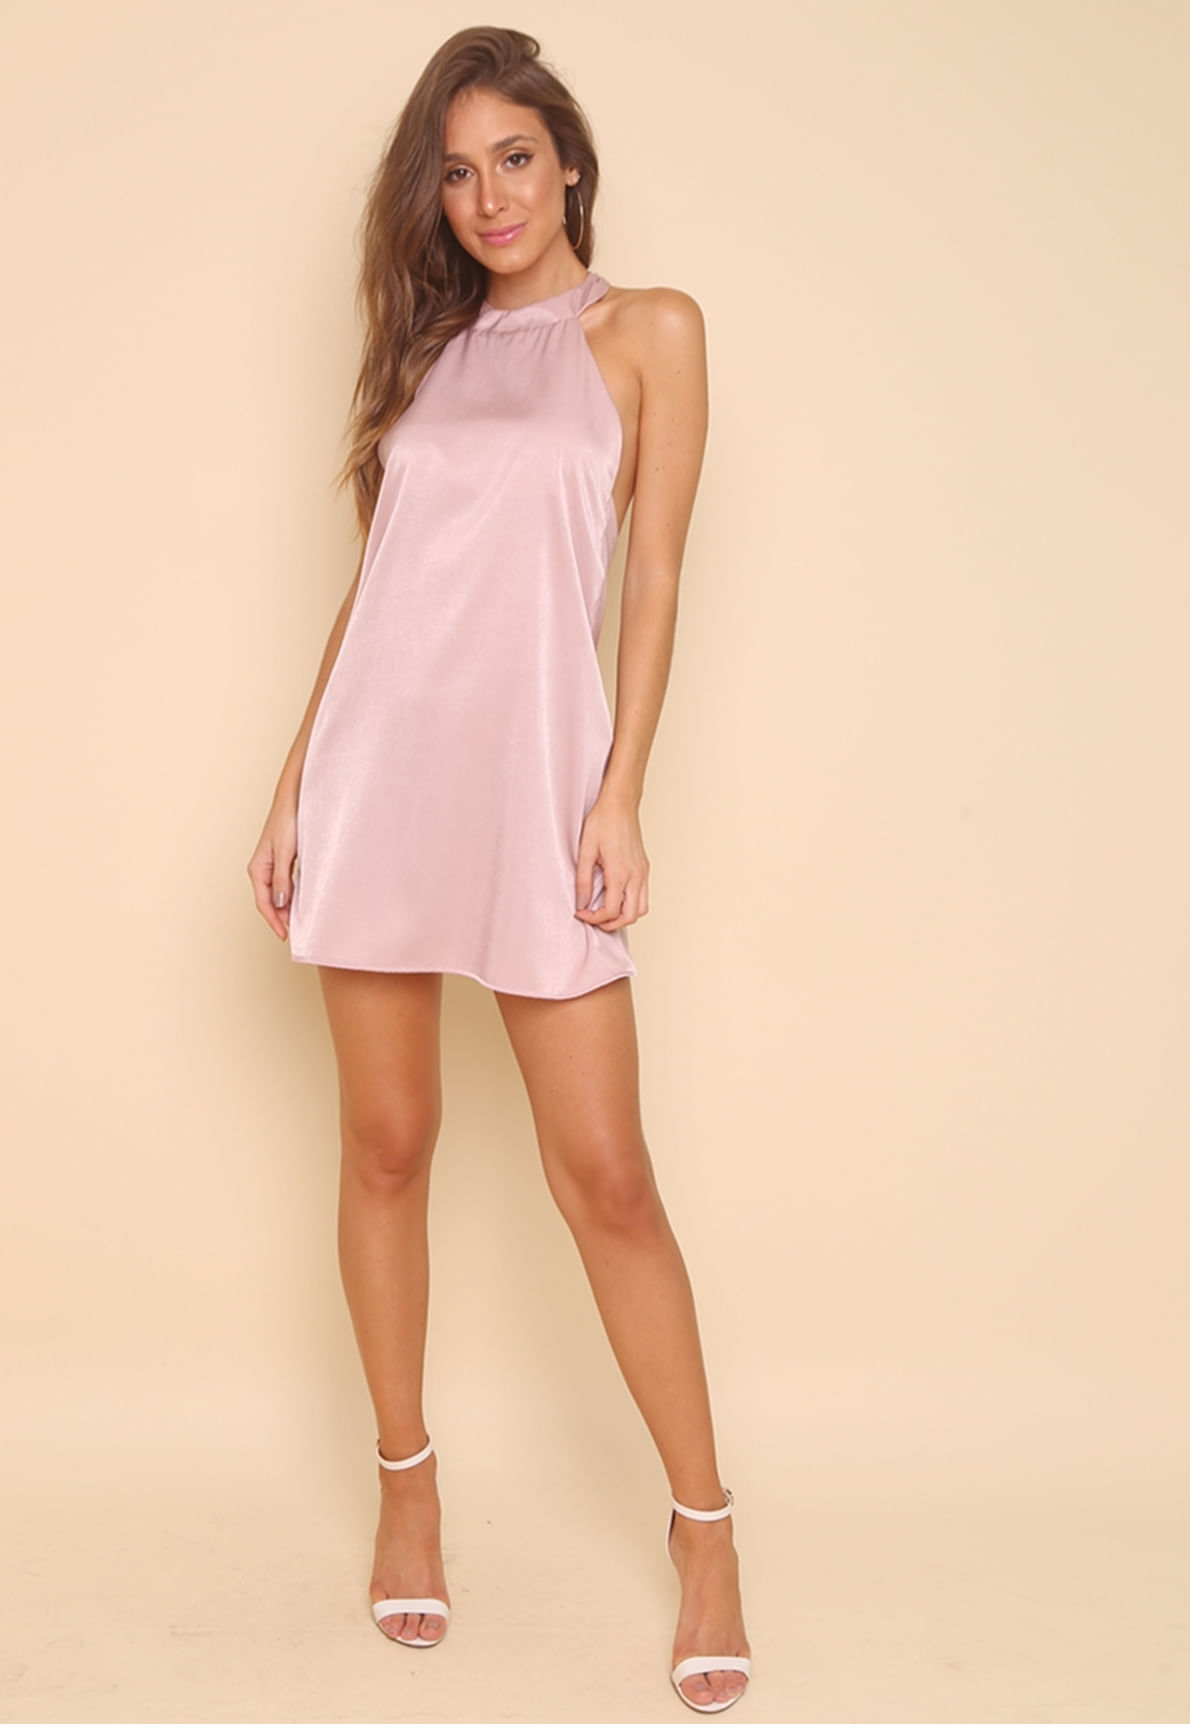 27451-vestido-rose-renata-mundo-lolita-01